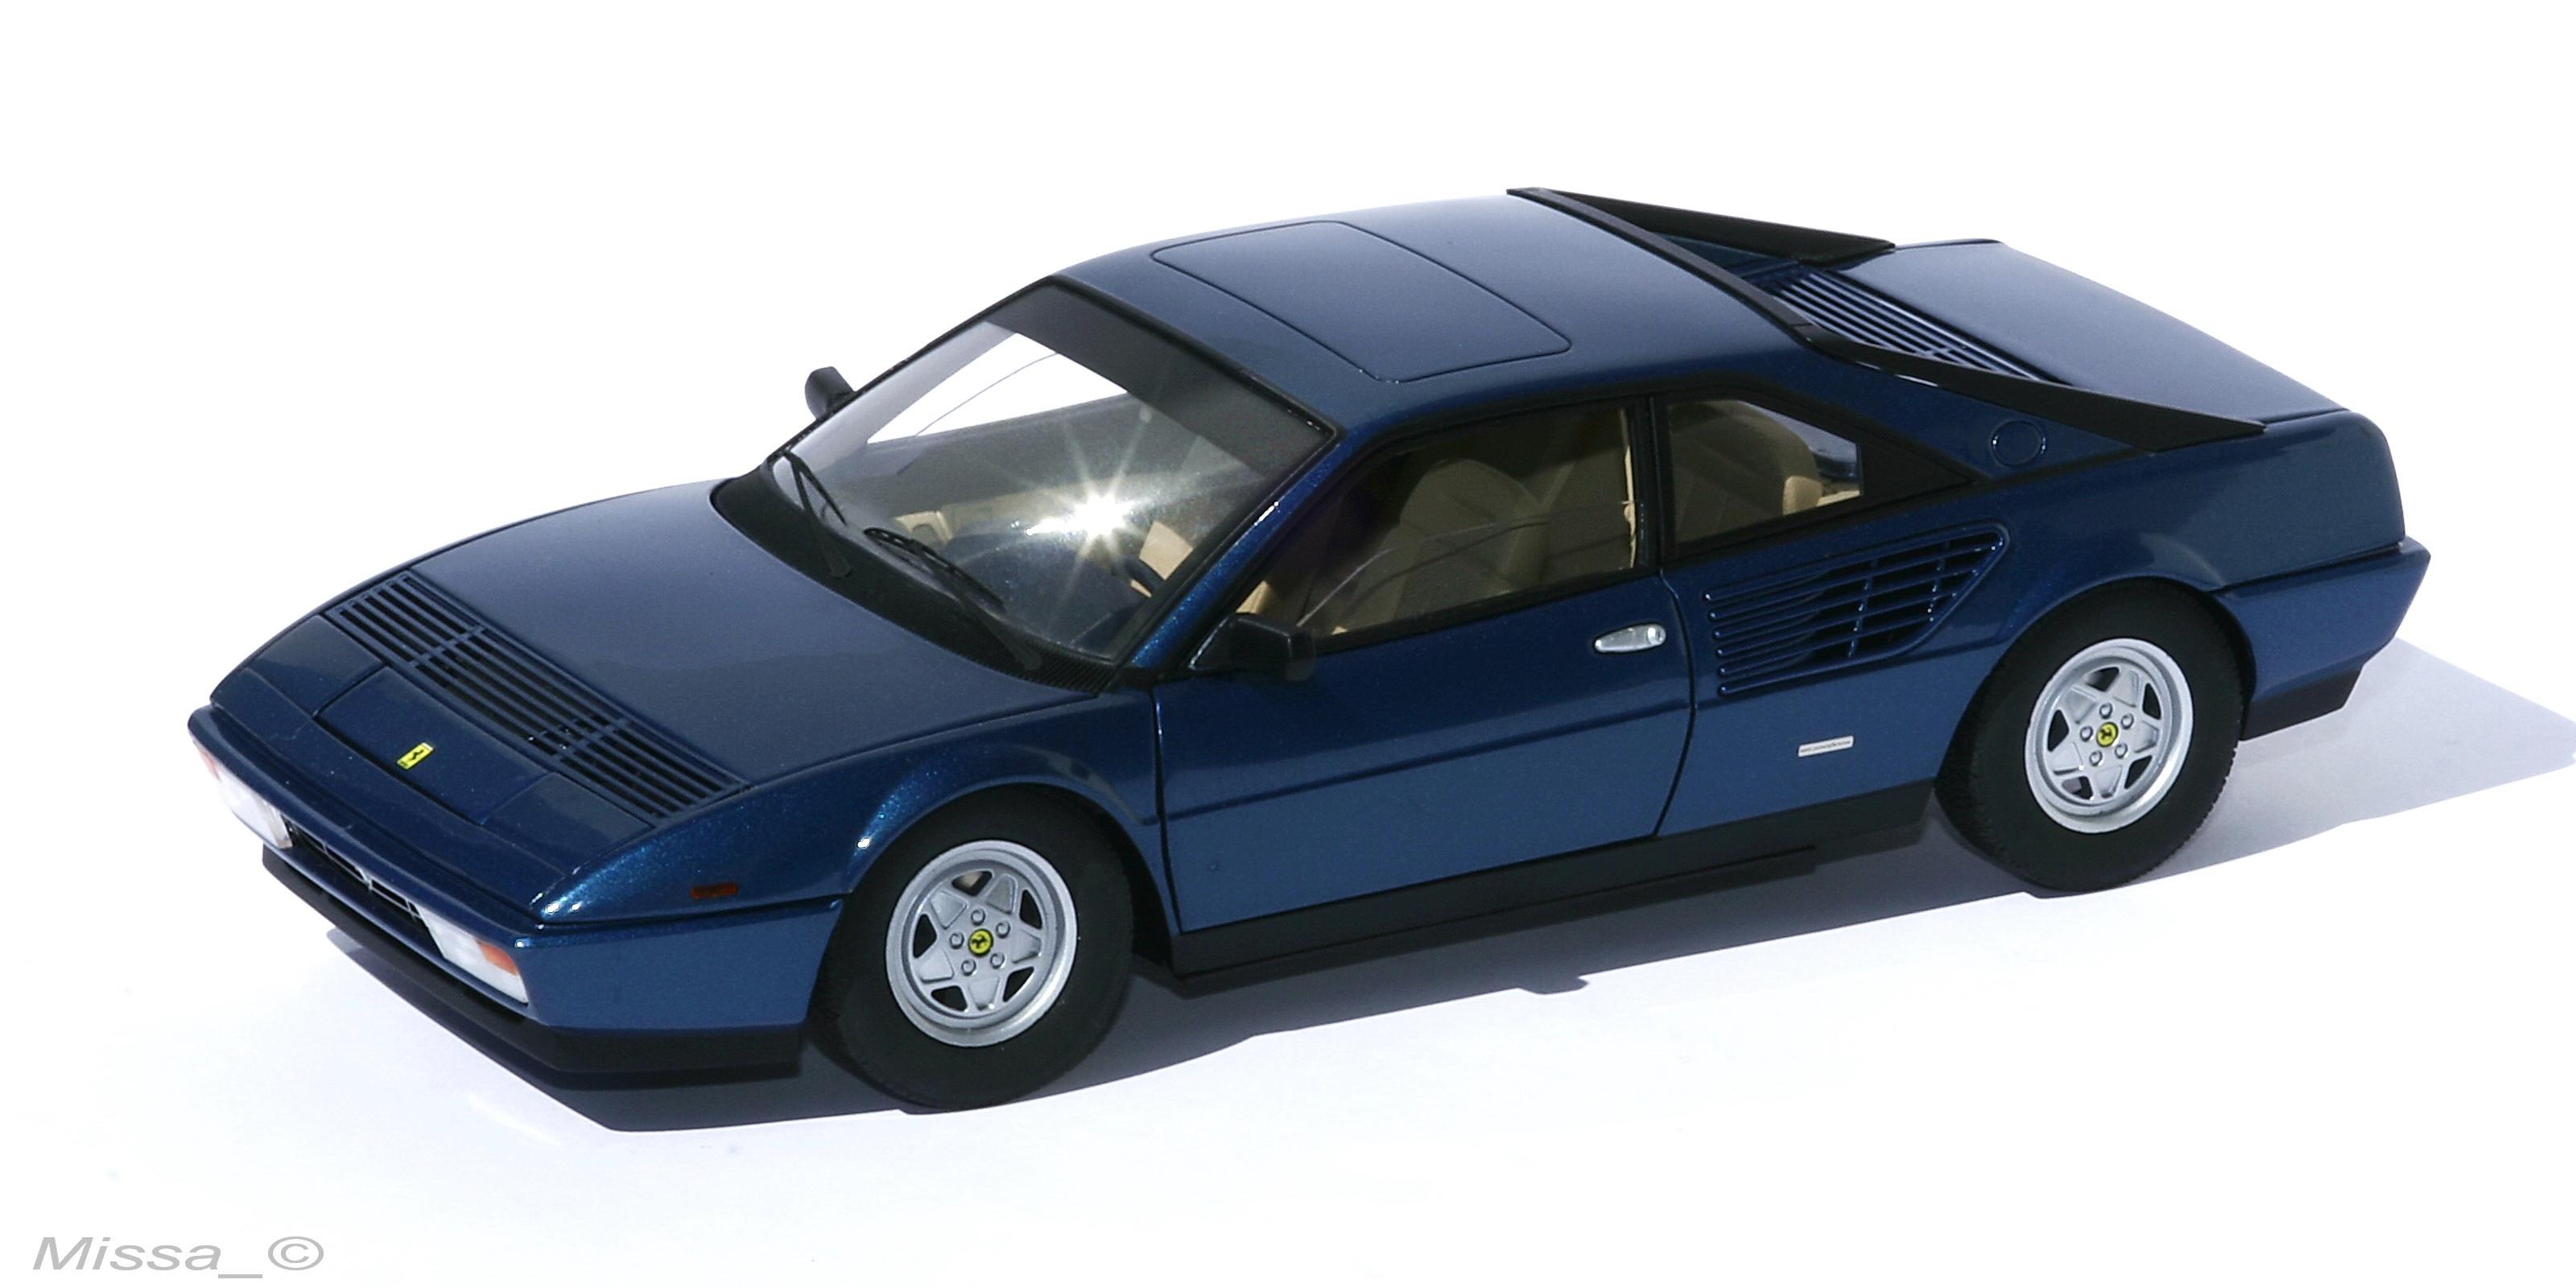 009_elite_ferrari_monpyky5 Fabulous Ferrari Mondial 8 Super Elite Cars Trend